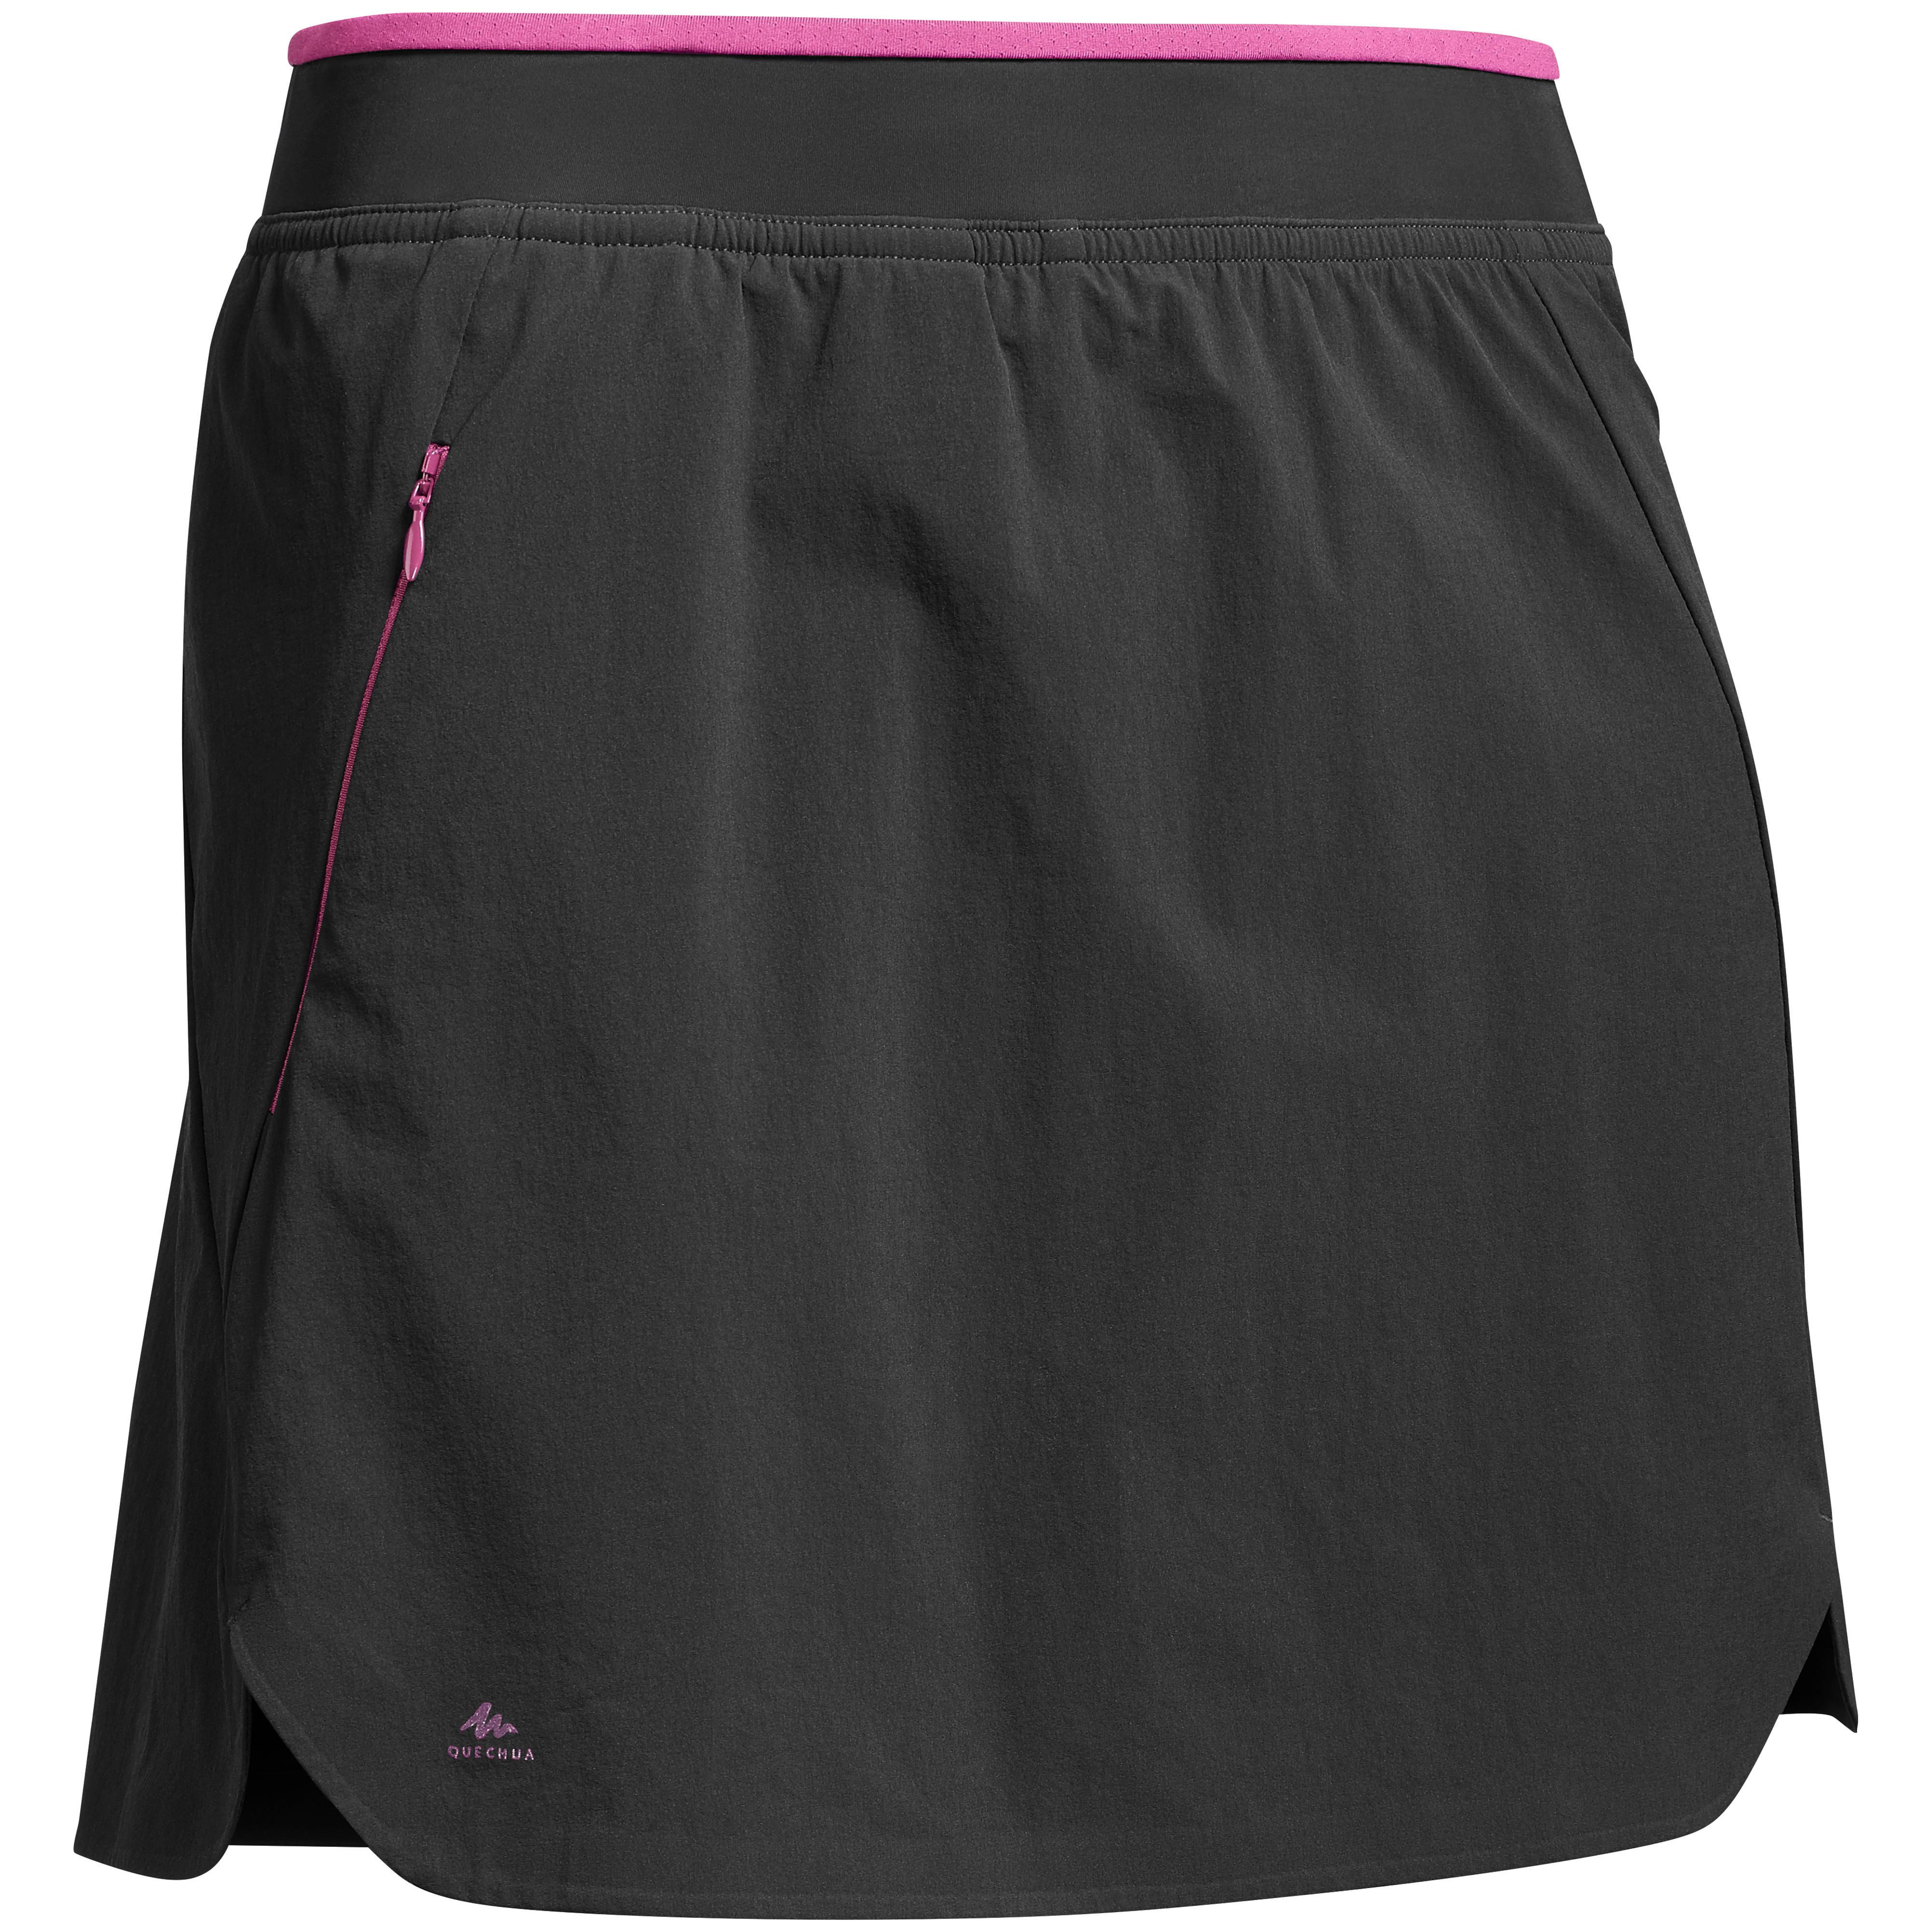 ffab9904fd230 Shorts et jupes de randonnée femme   Decathlon